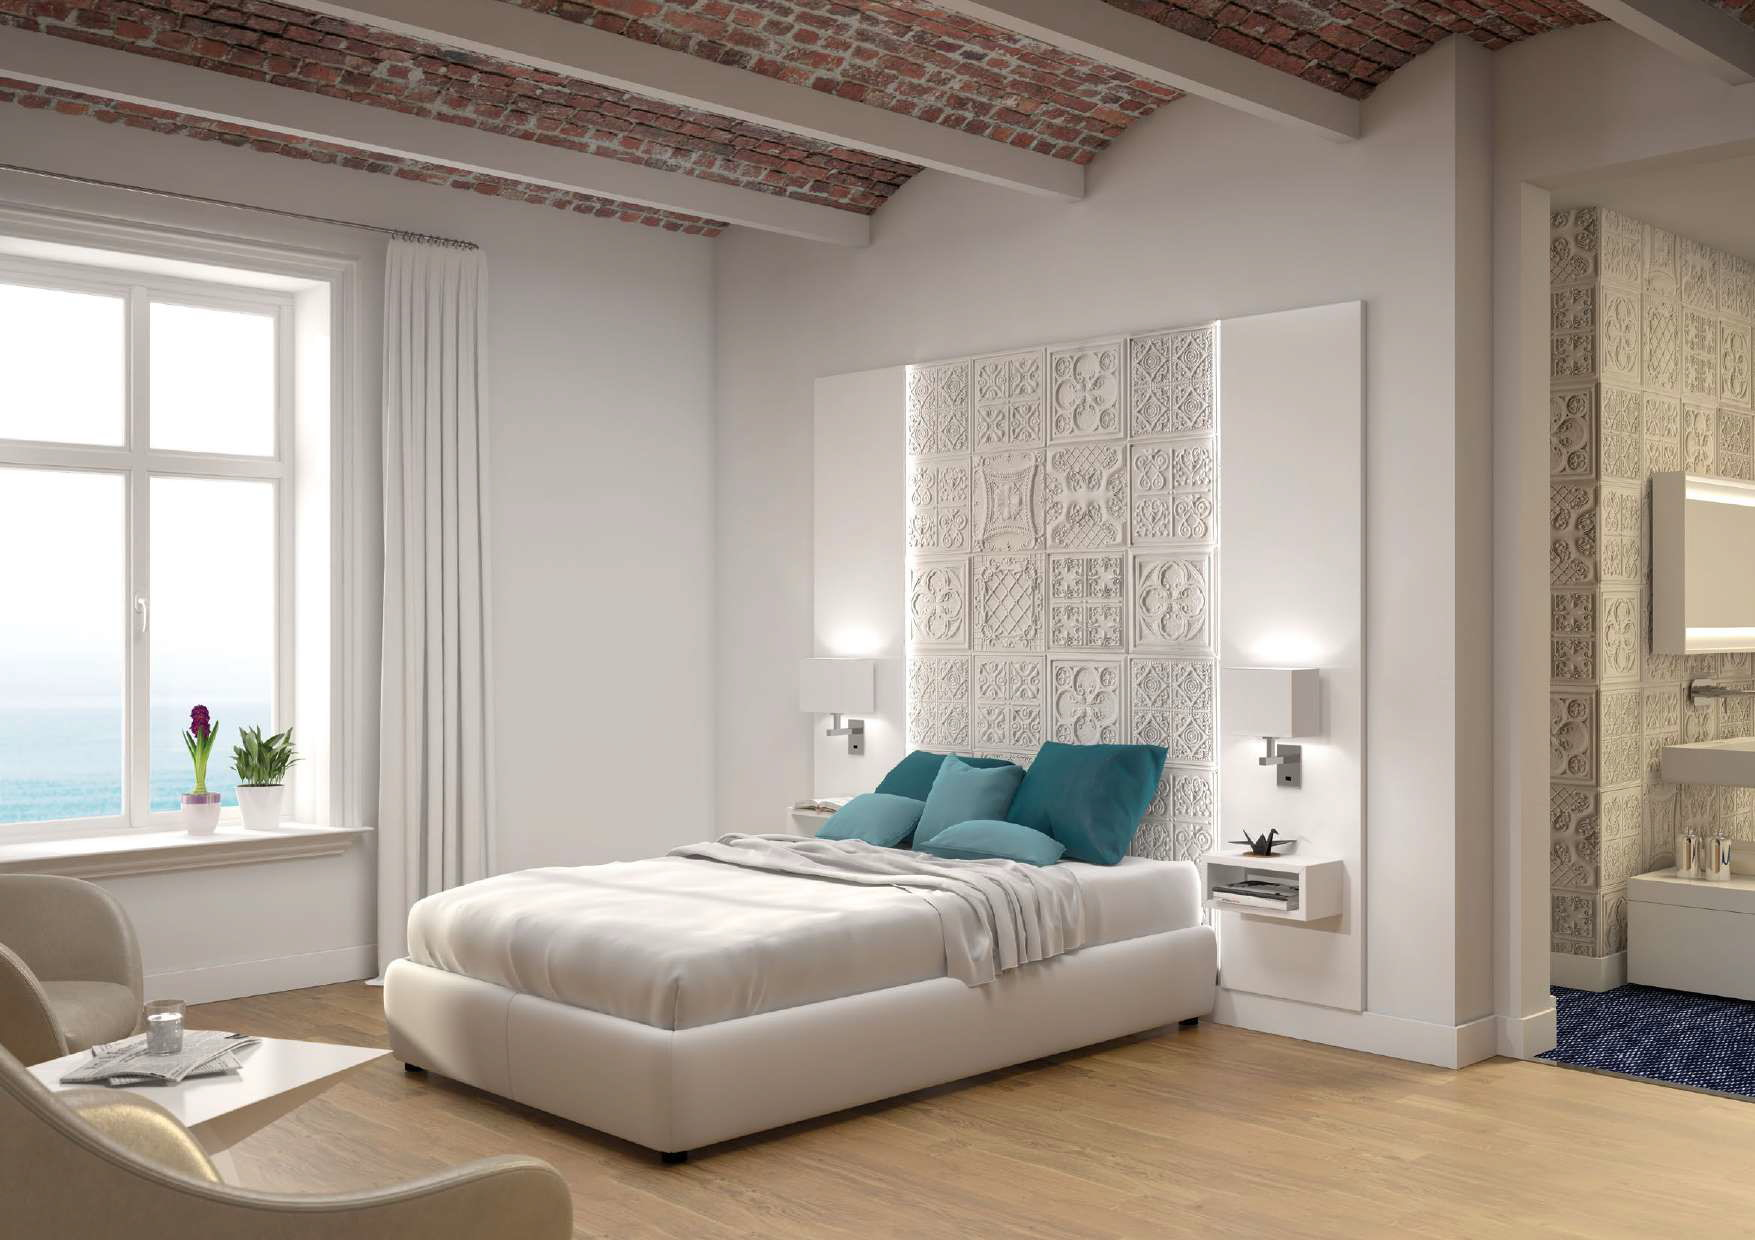 PanelPiedra Vintage Veralles Blanco Italia Wandverkleidung Wandpaneele